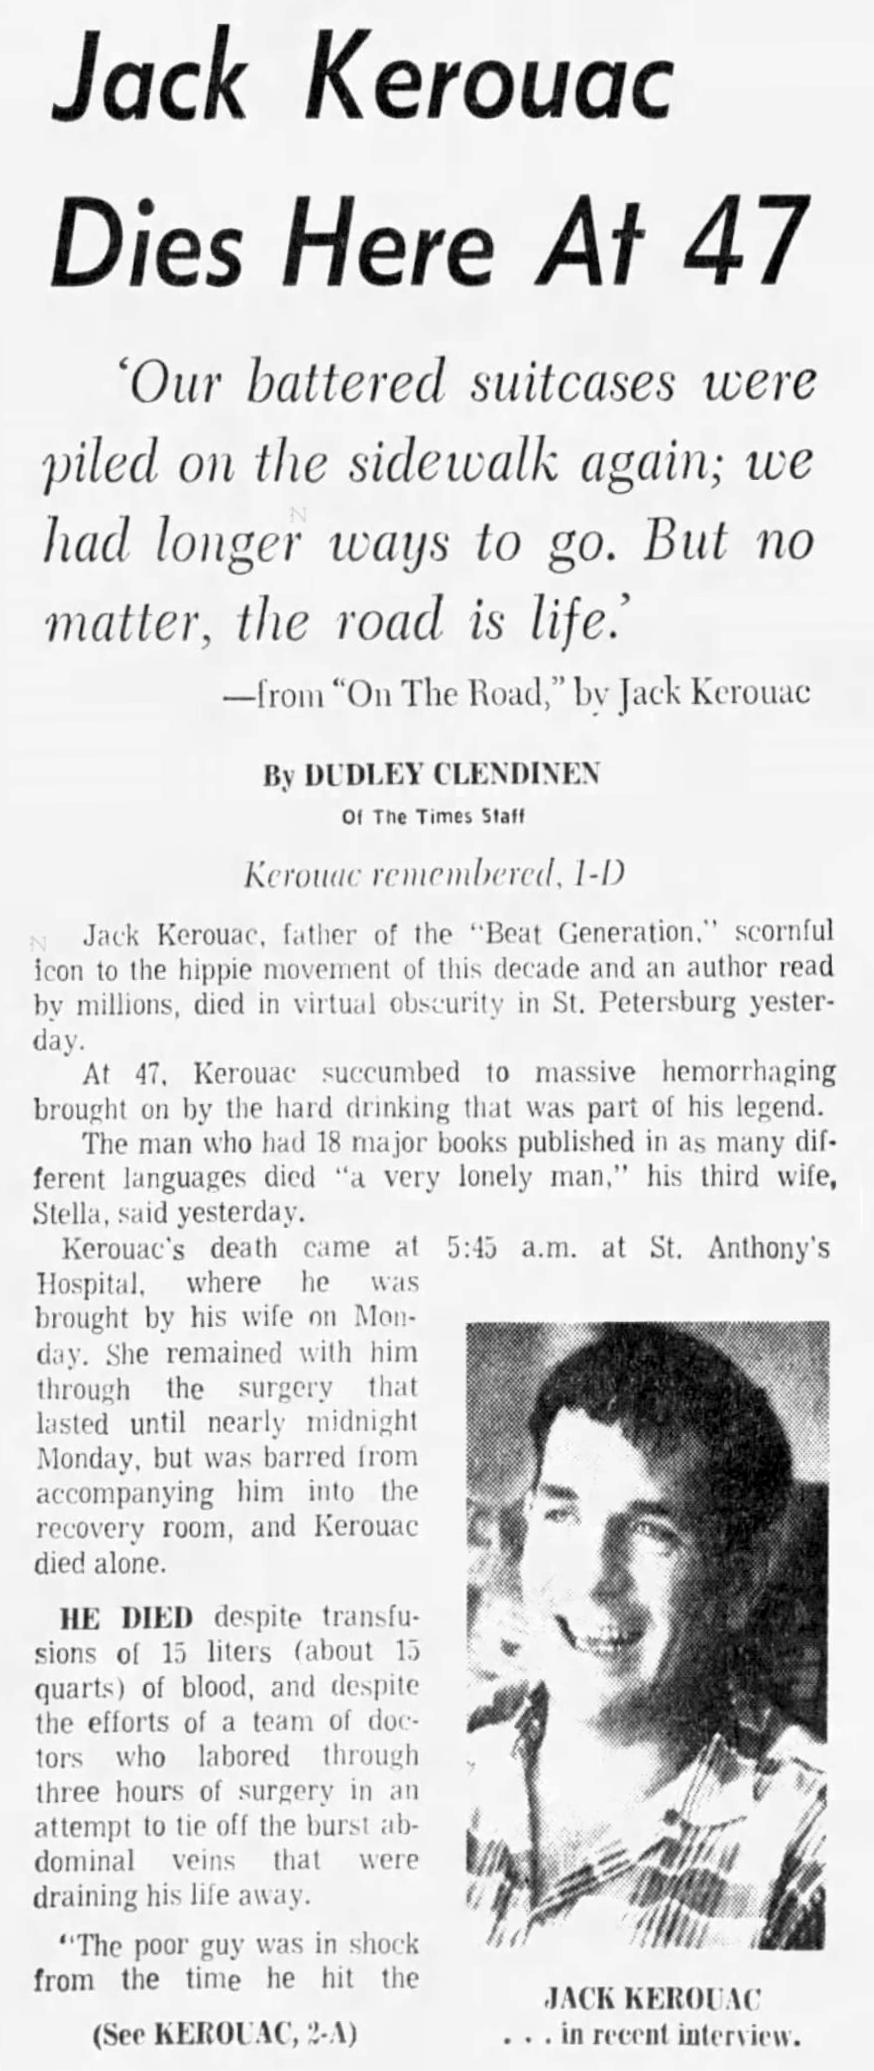 Nécrologie de Jack Kerouac dans le Tampa Bay Times , 22 oct 1969 (source : Newspapers.com)